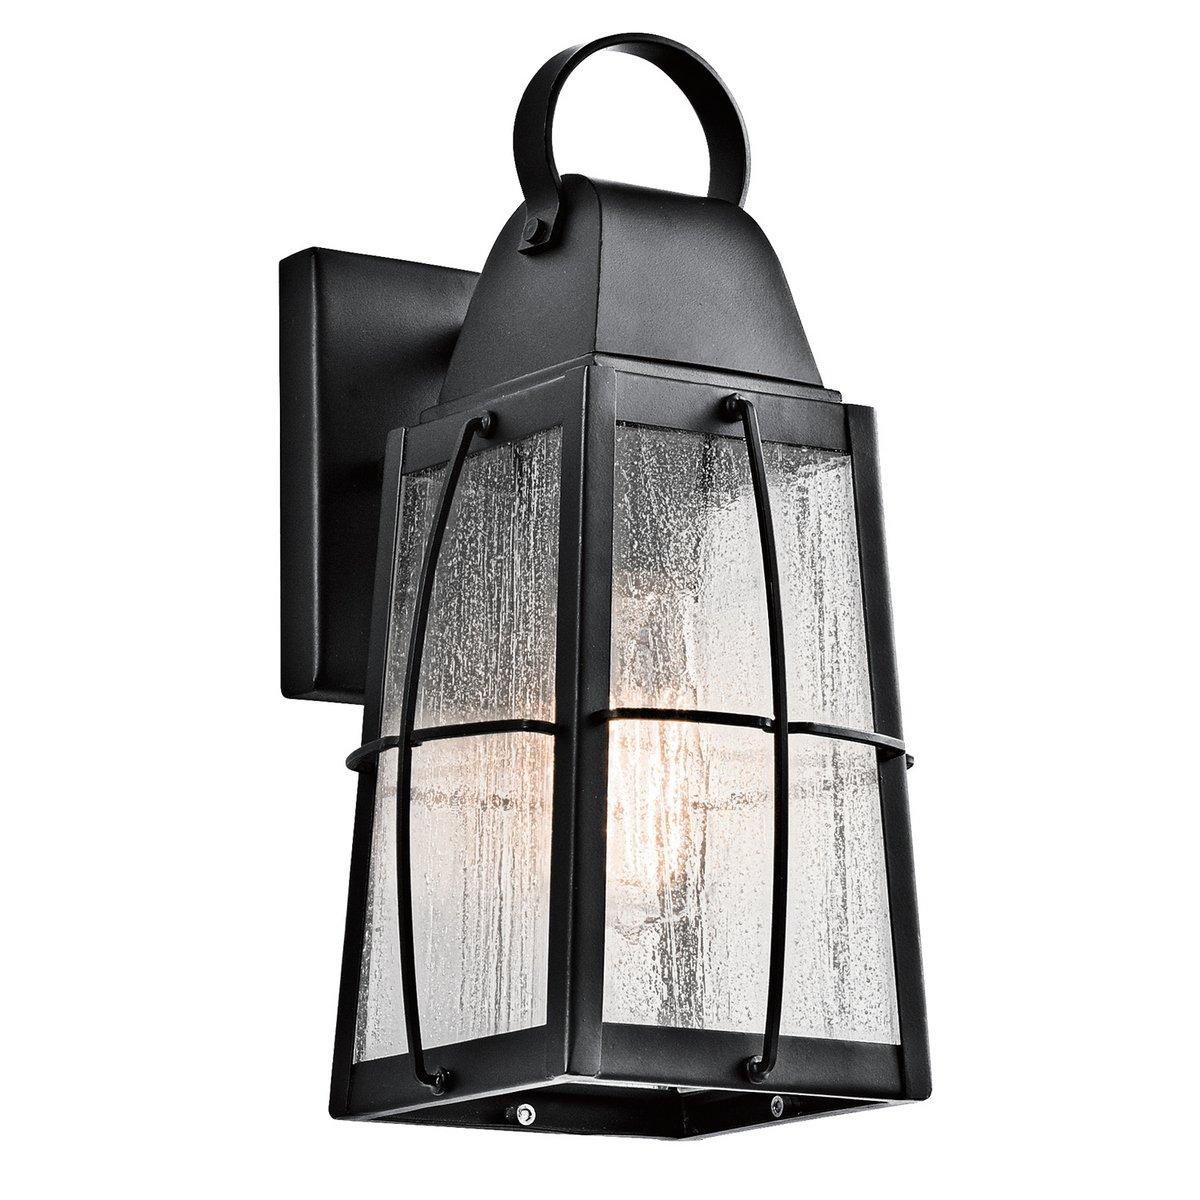 Kichler 49552BKT Tolerand 1-Light 12'' Outdoor Medium Wall in Textured Black